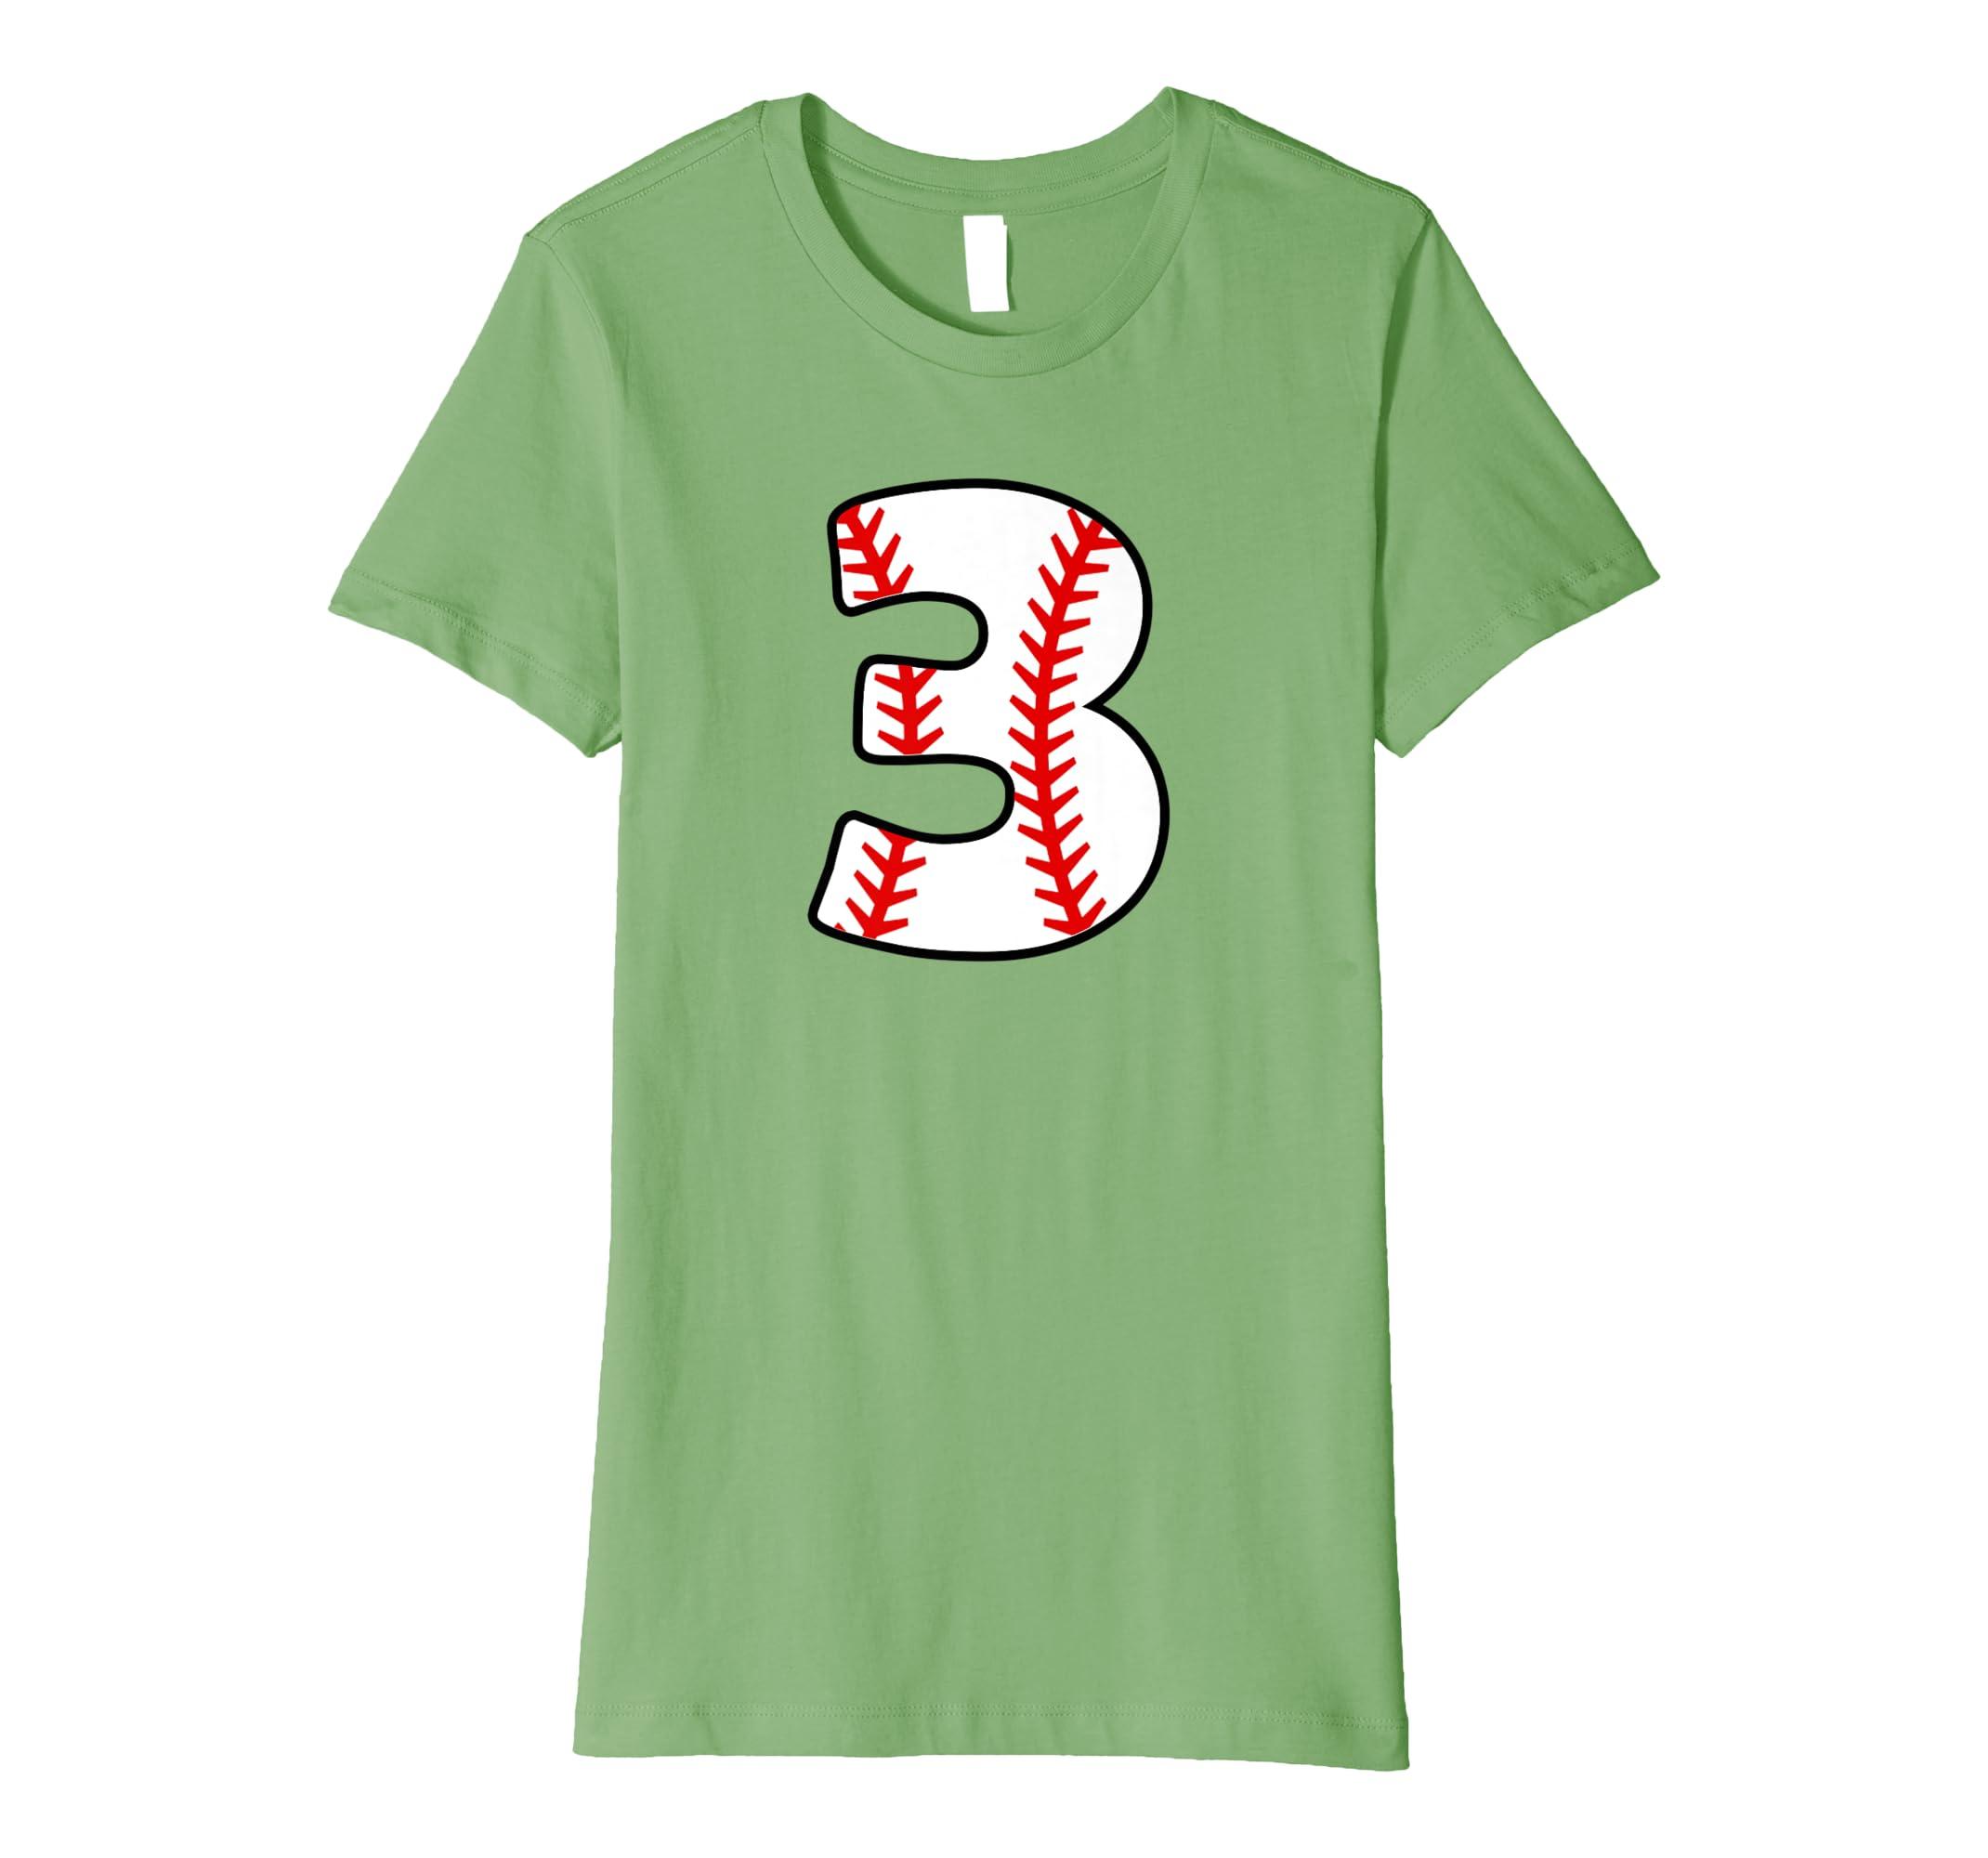 Third Birthday 3rd BASEBALL Shirt   Number 3 Born in 2015-Teechatpro